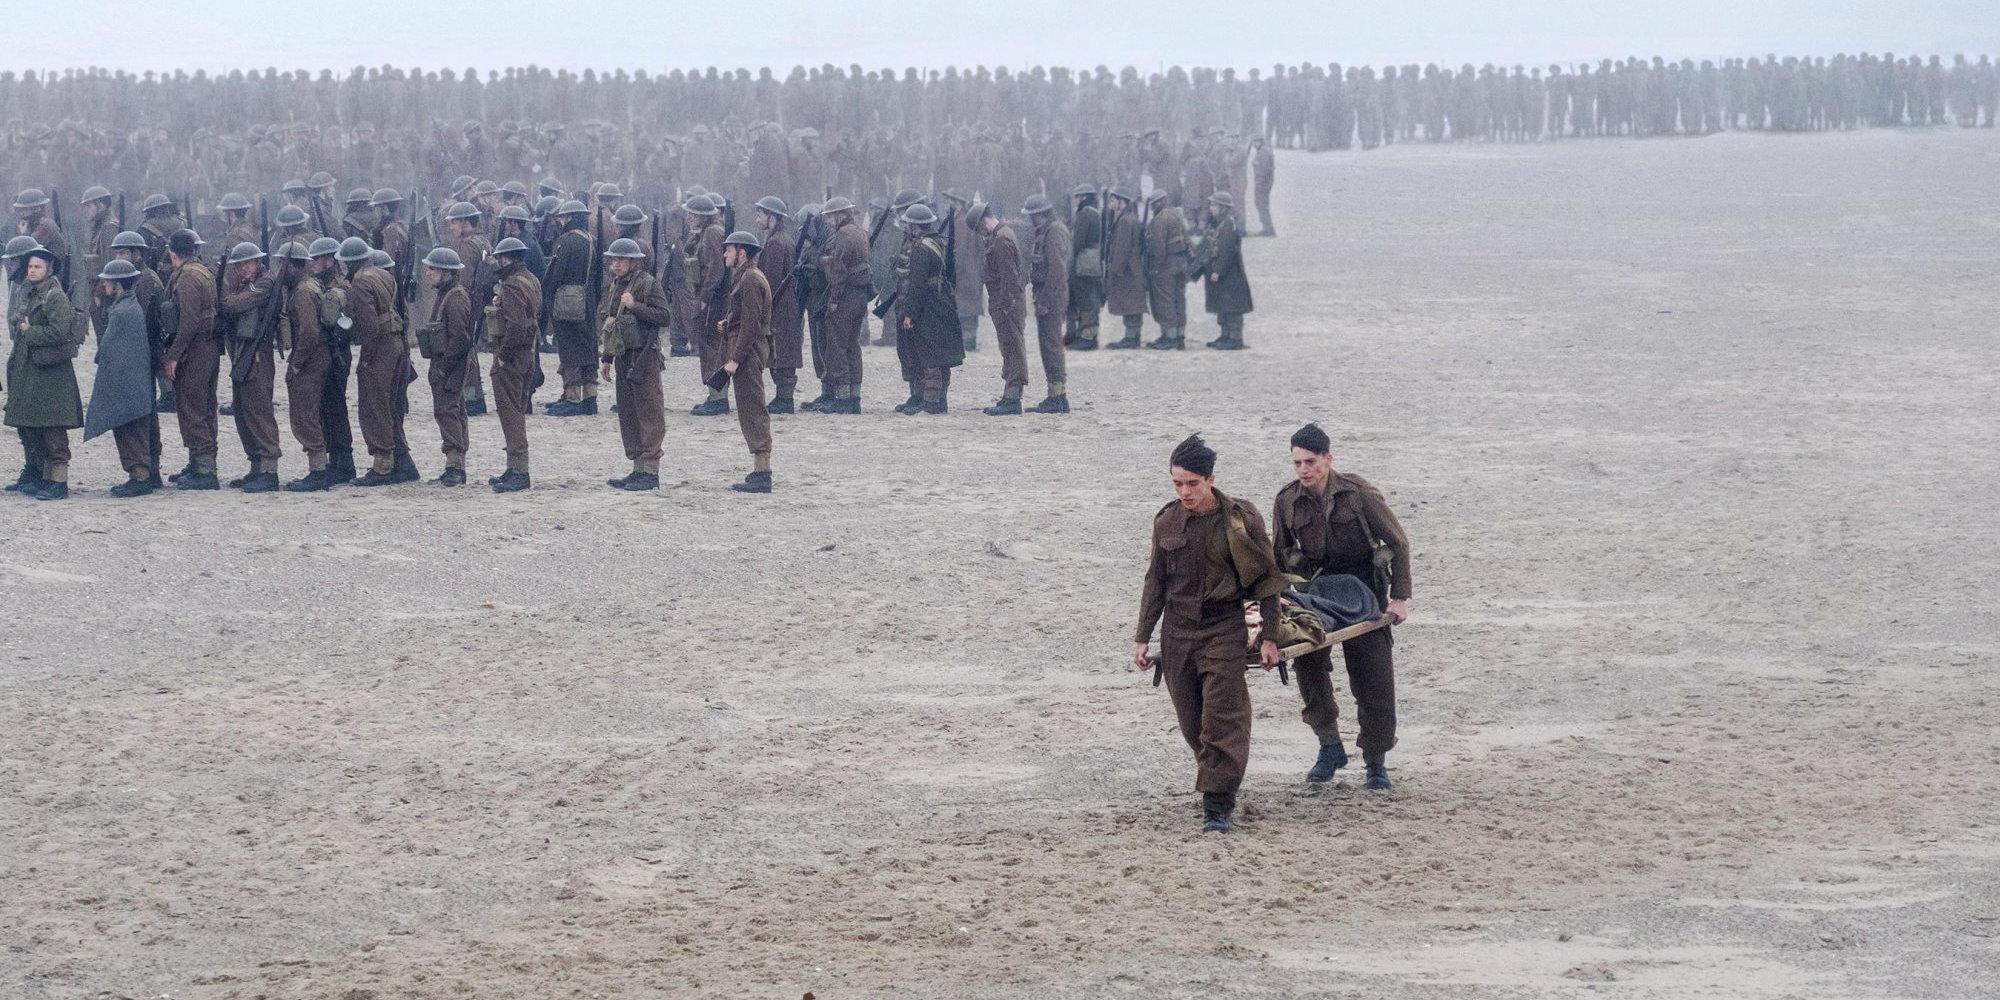 Christopher Nolan's Dunkirk Features Handheld IMAX Camerawork